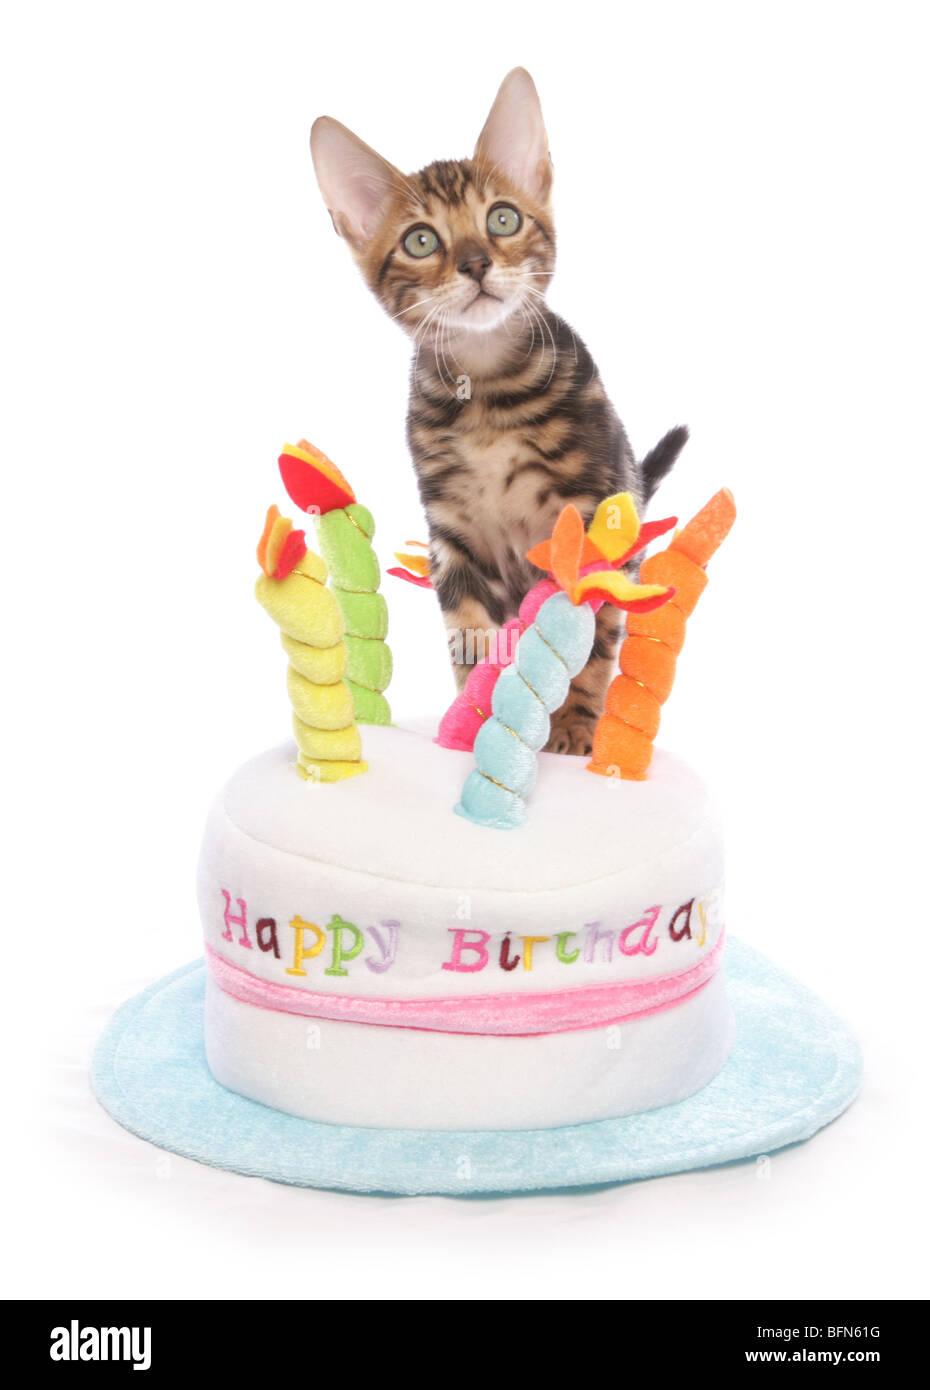 Fabulous Bengal Kitten On Birthday Cake Hat Single Young Male Studio Stock Funny Birthday Cards Online Aboleapandamsfinfo